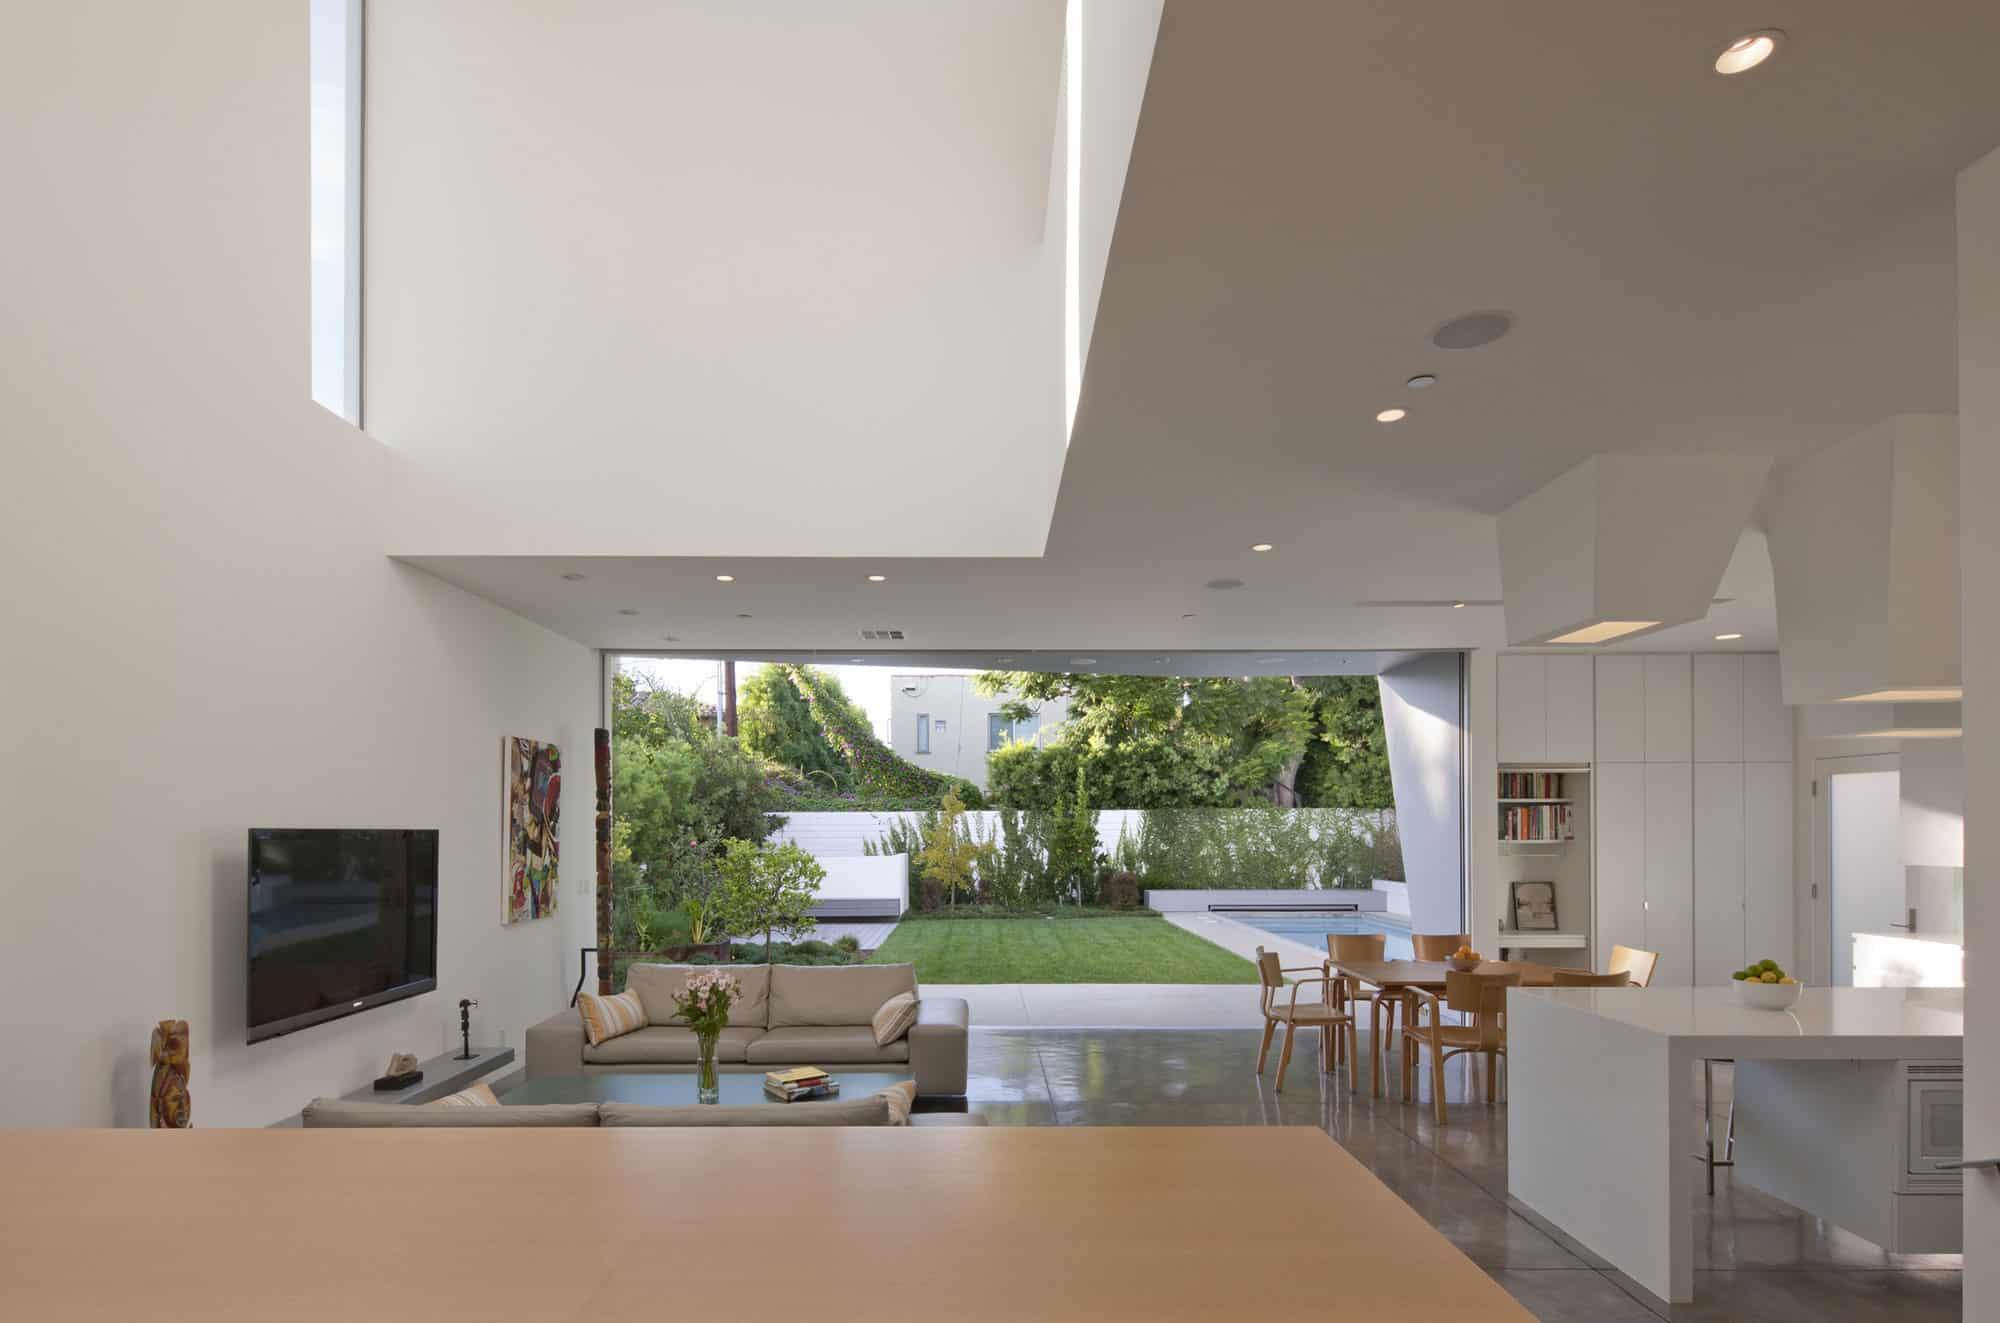 Holleb Residence by John Friedman Alice Kimm Architects